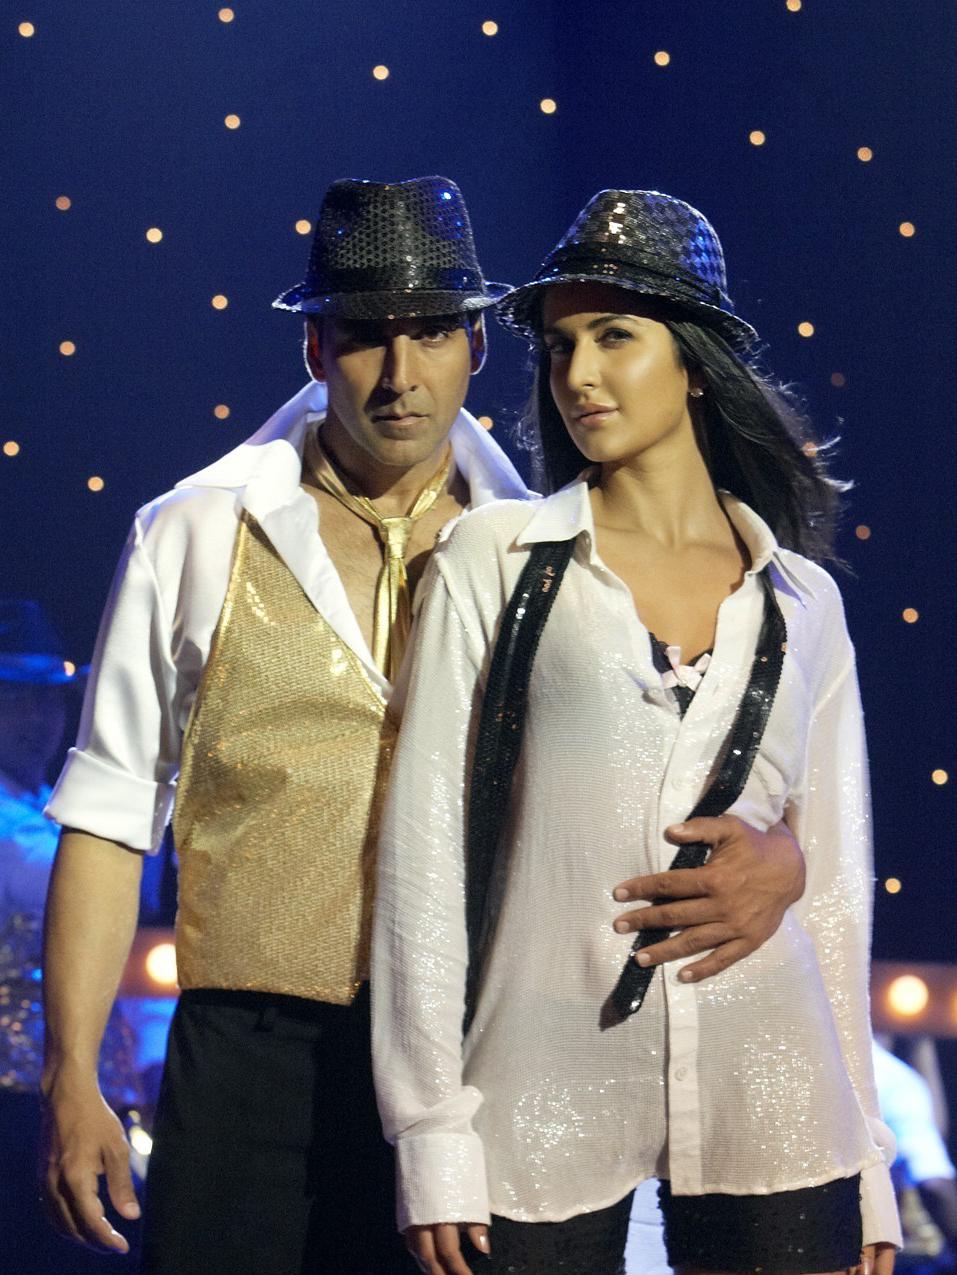 Only-Katrina Katrina Kaif In Sheila Ki Jawani Song